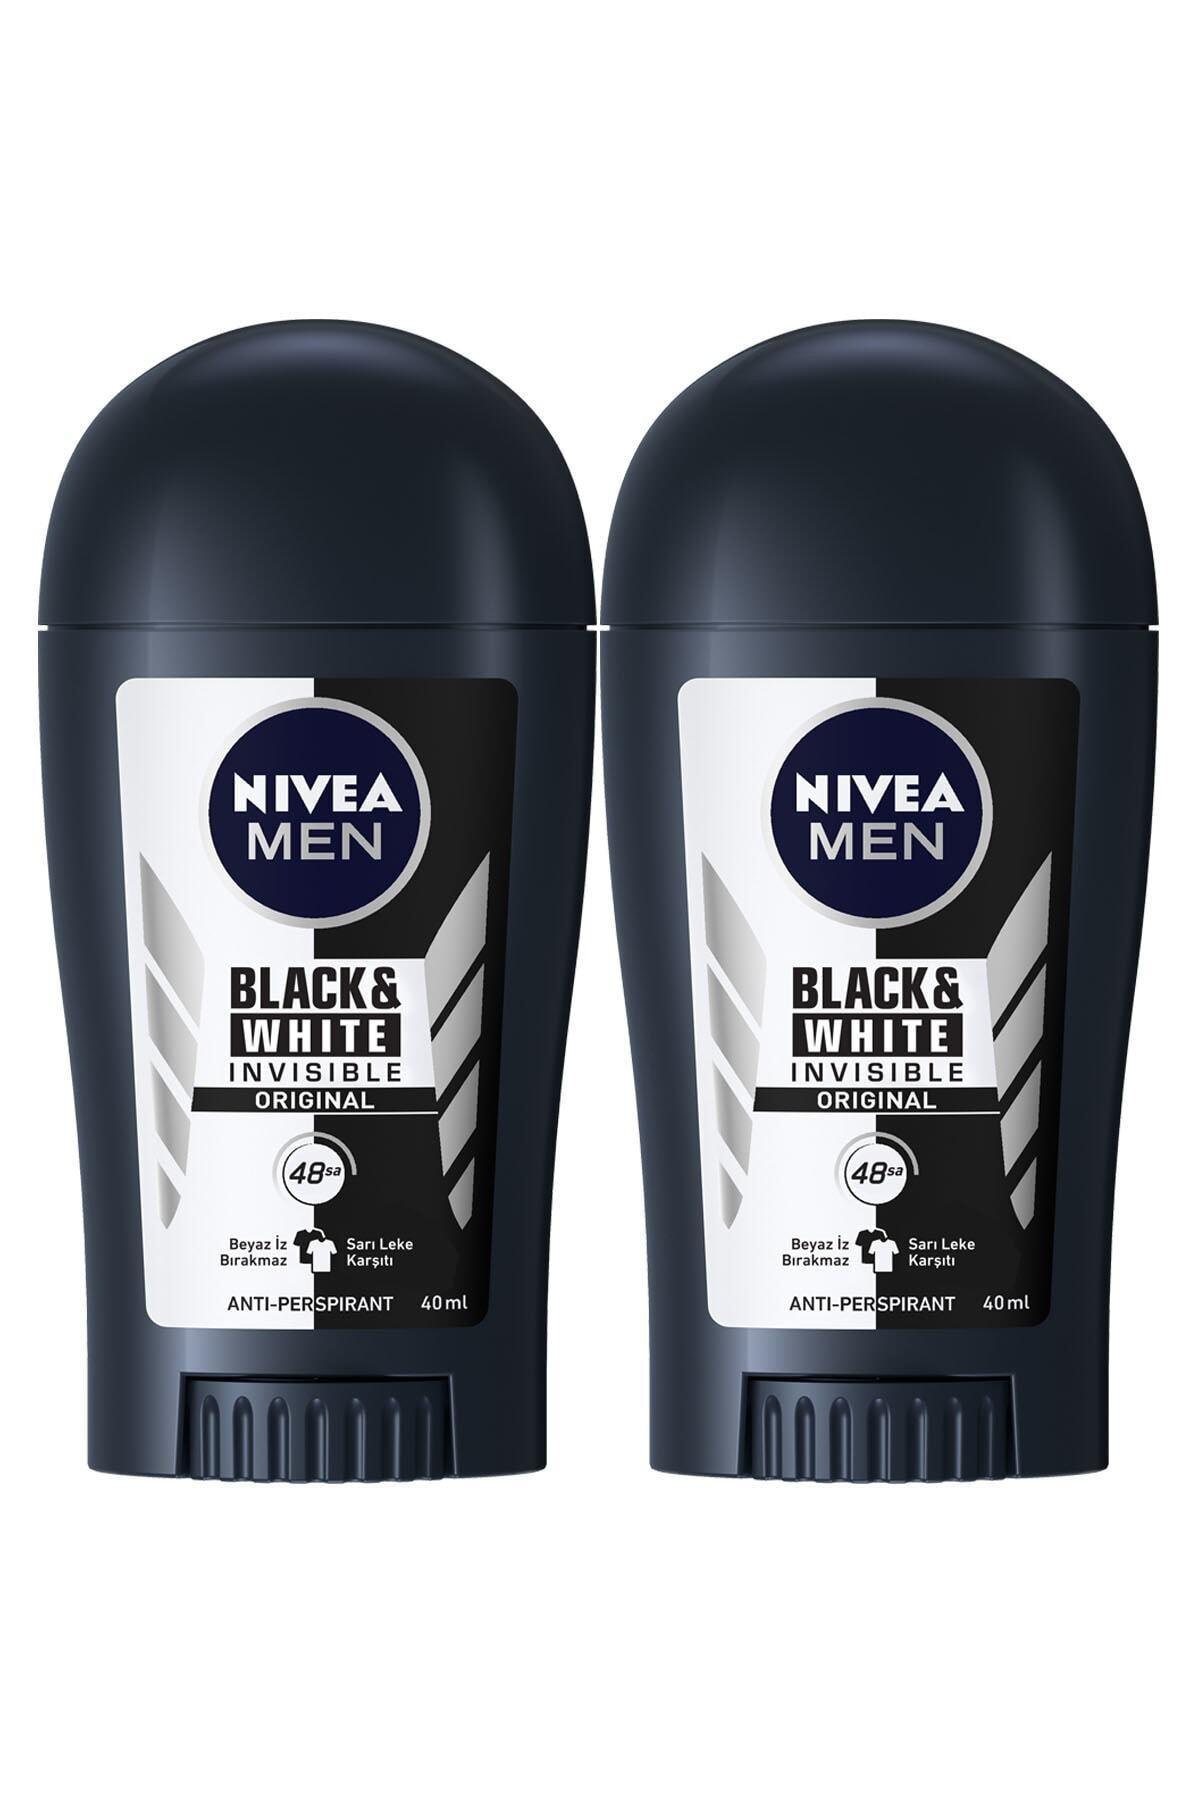 Nivea Men Invisible Black&White Original Erkek Deodorant Stick 40 ml  2'Li 1